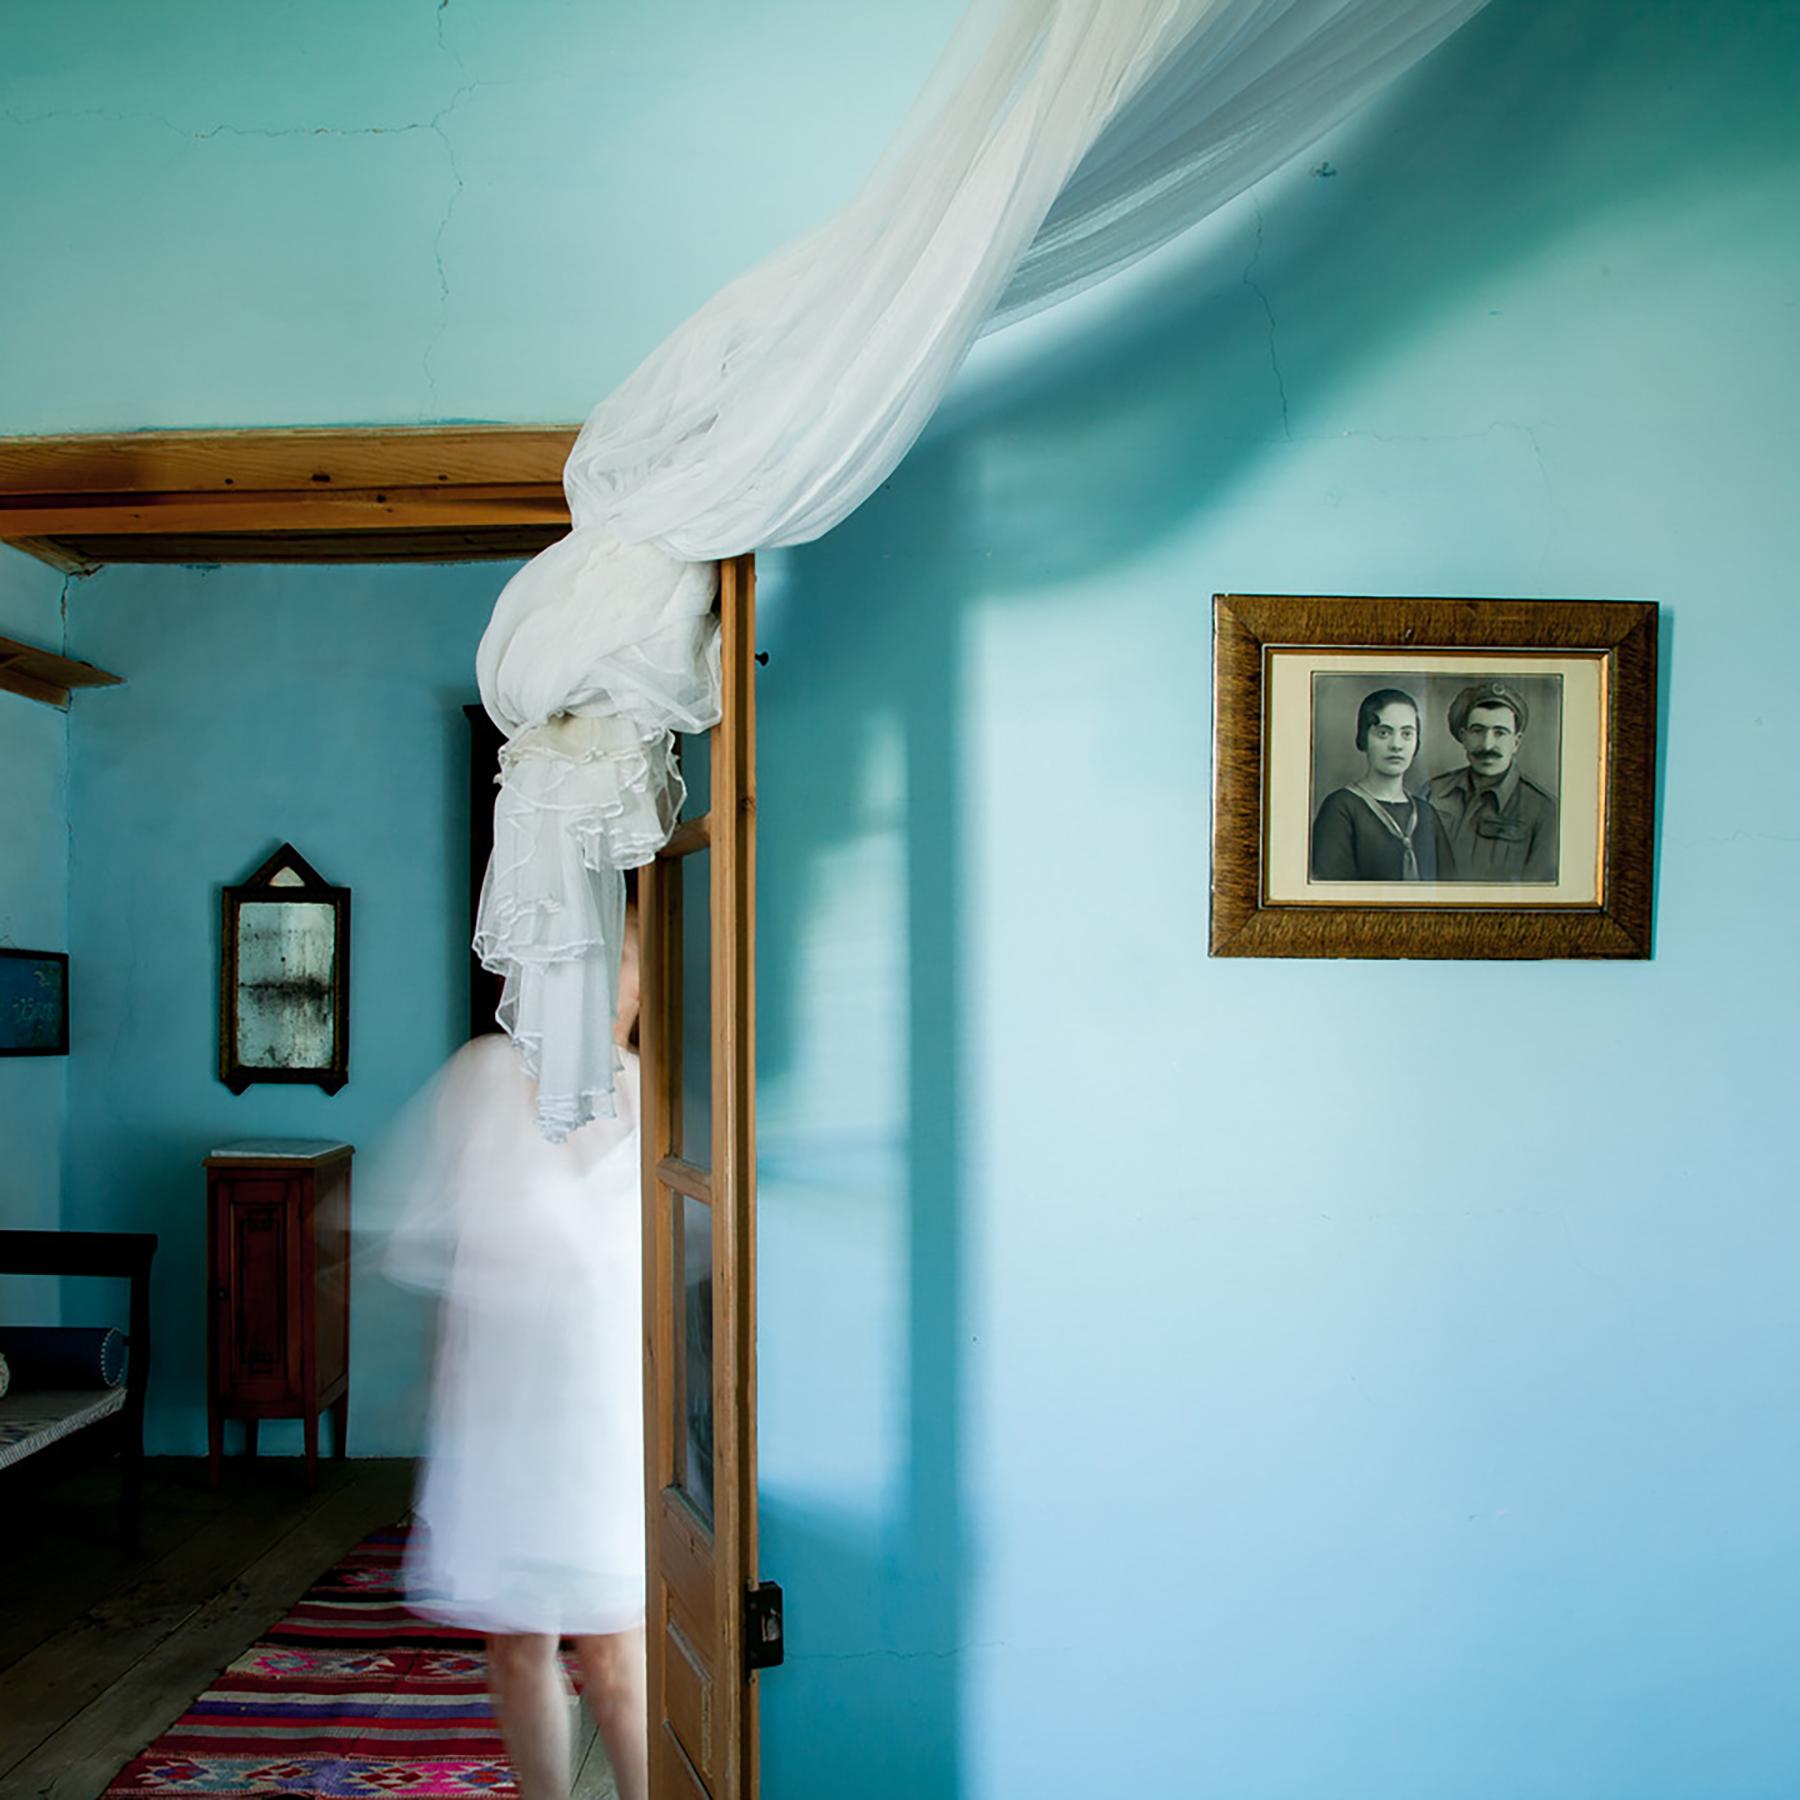 Bastienne_Schmidt.Ghosts.of.Pagondas.Greece1.jpg